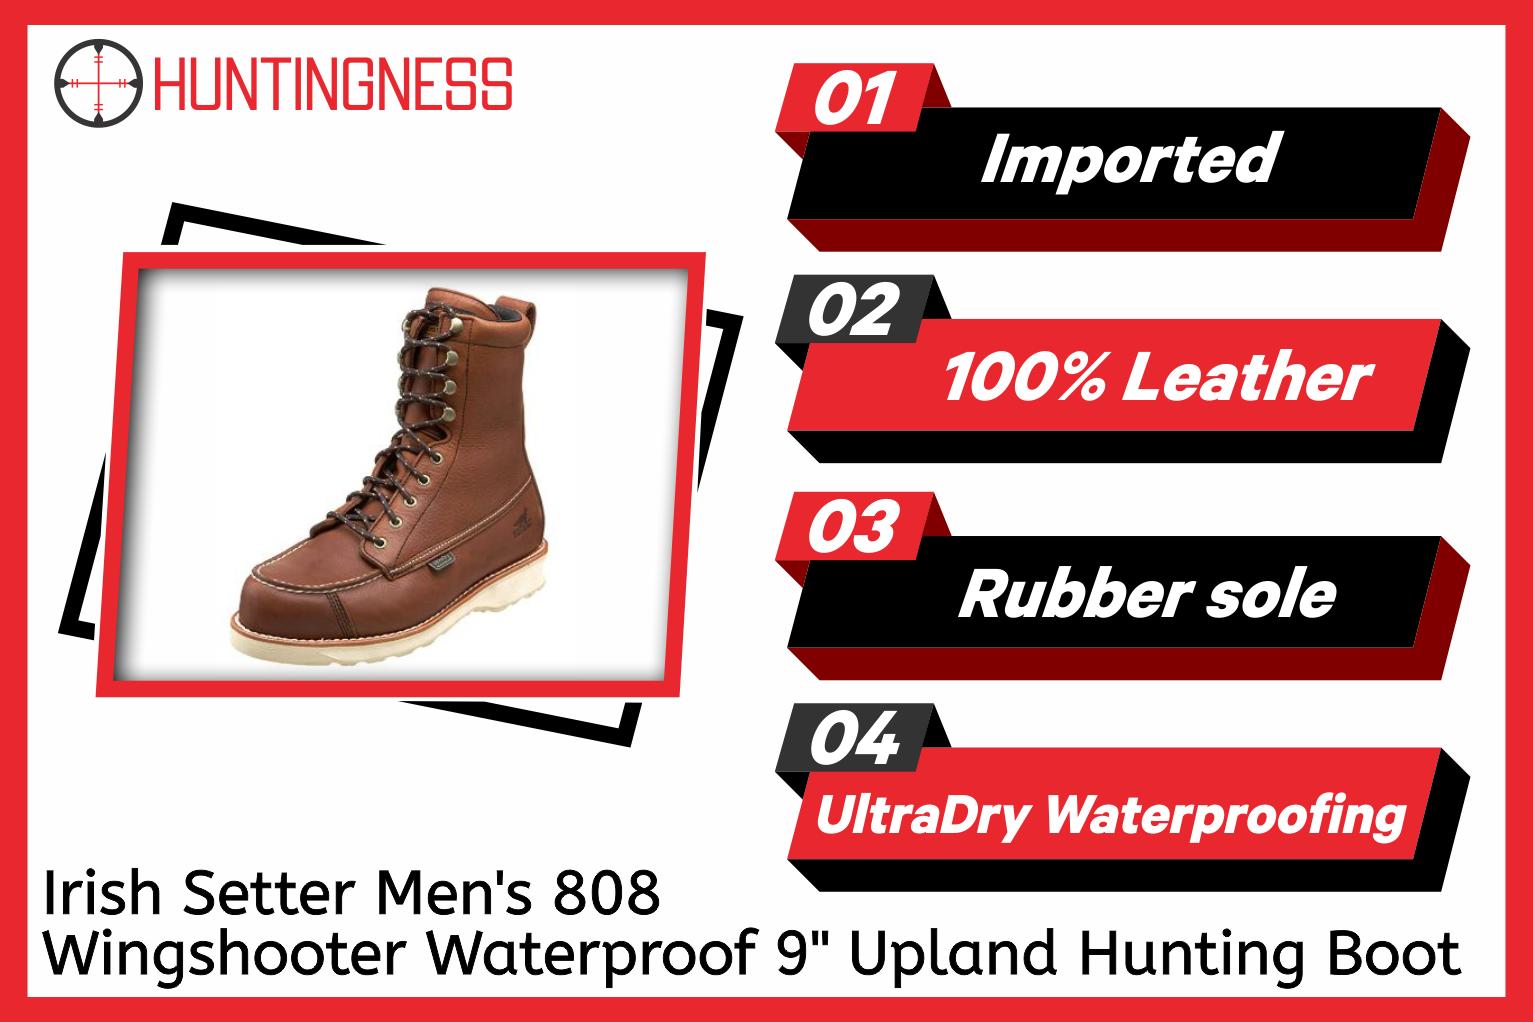 "Irish Setter Men's 808 Wingshooter Waterproof 9"" Upland Hunting Boot infographic"